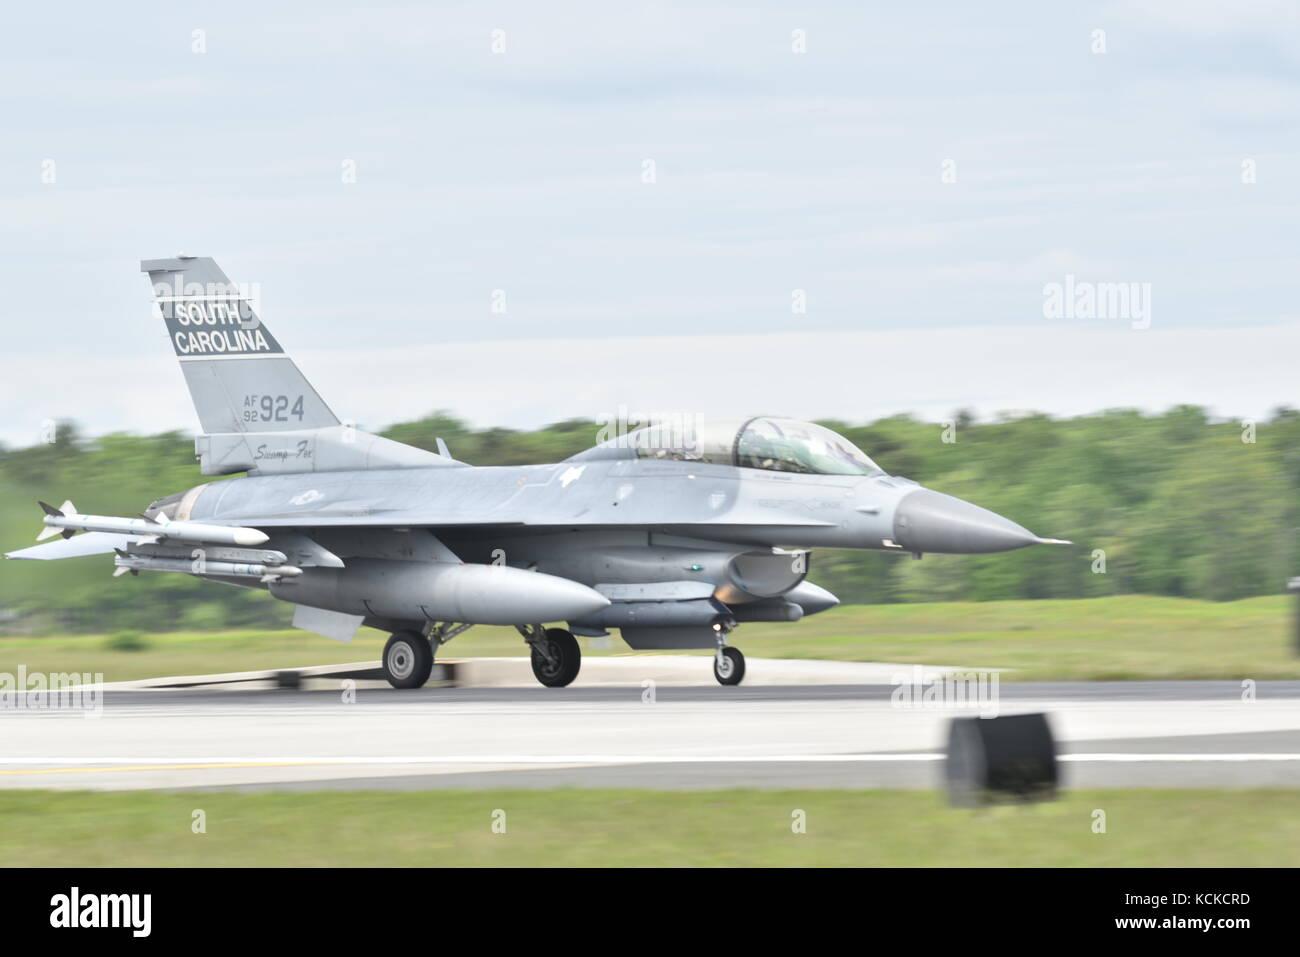 South Carolina Air National Guard F-16C Fighting Falcon - Stock Image